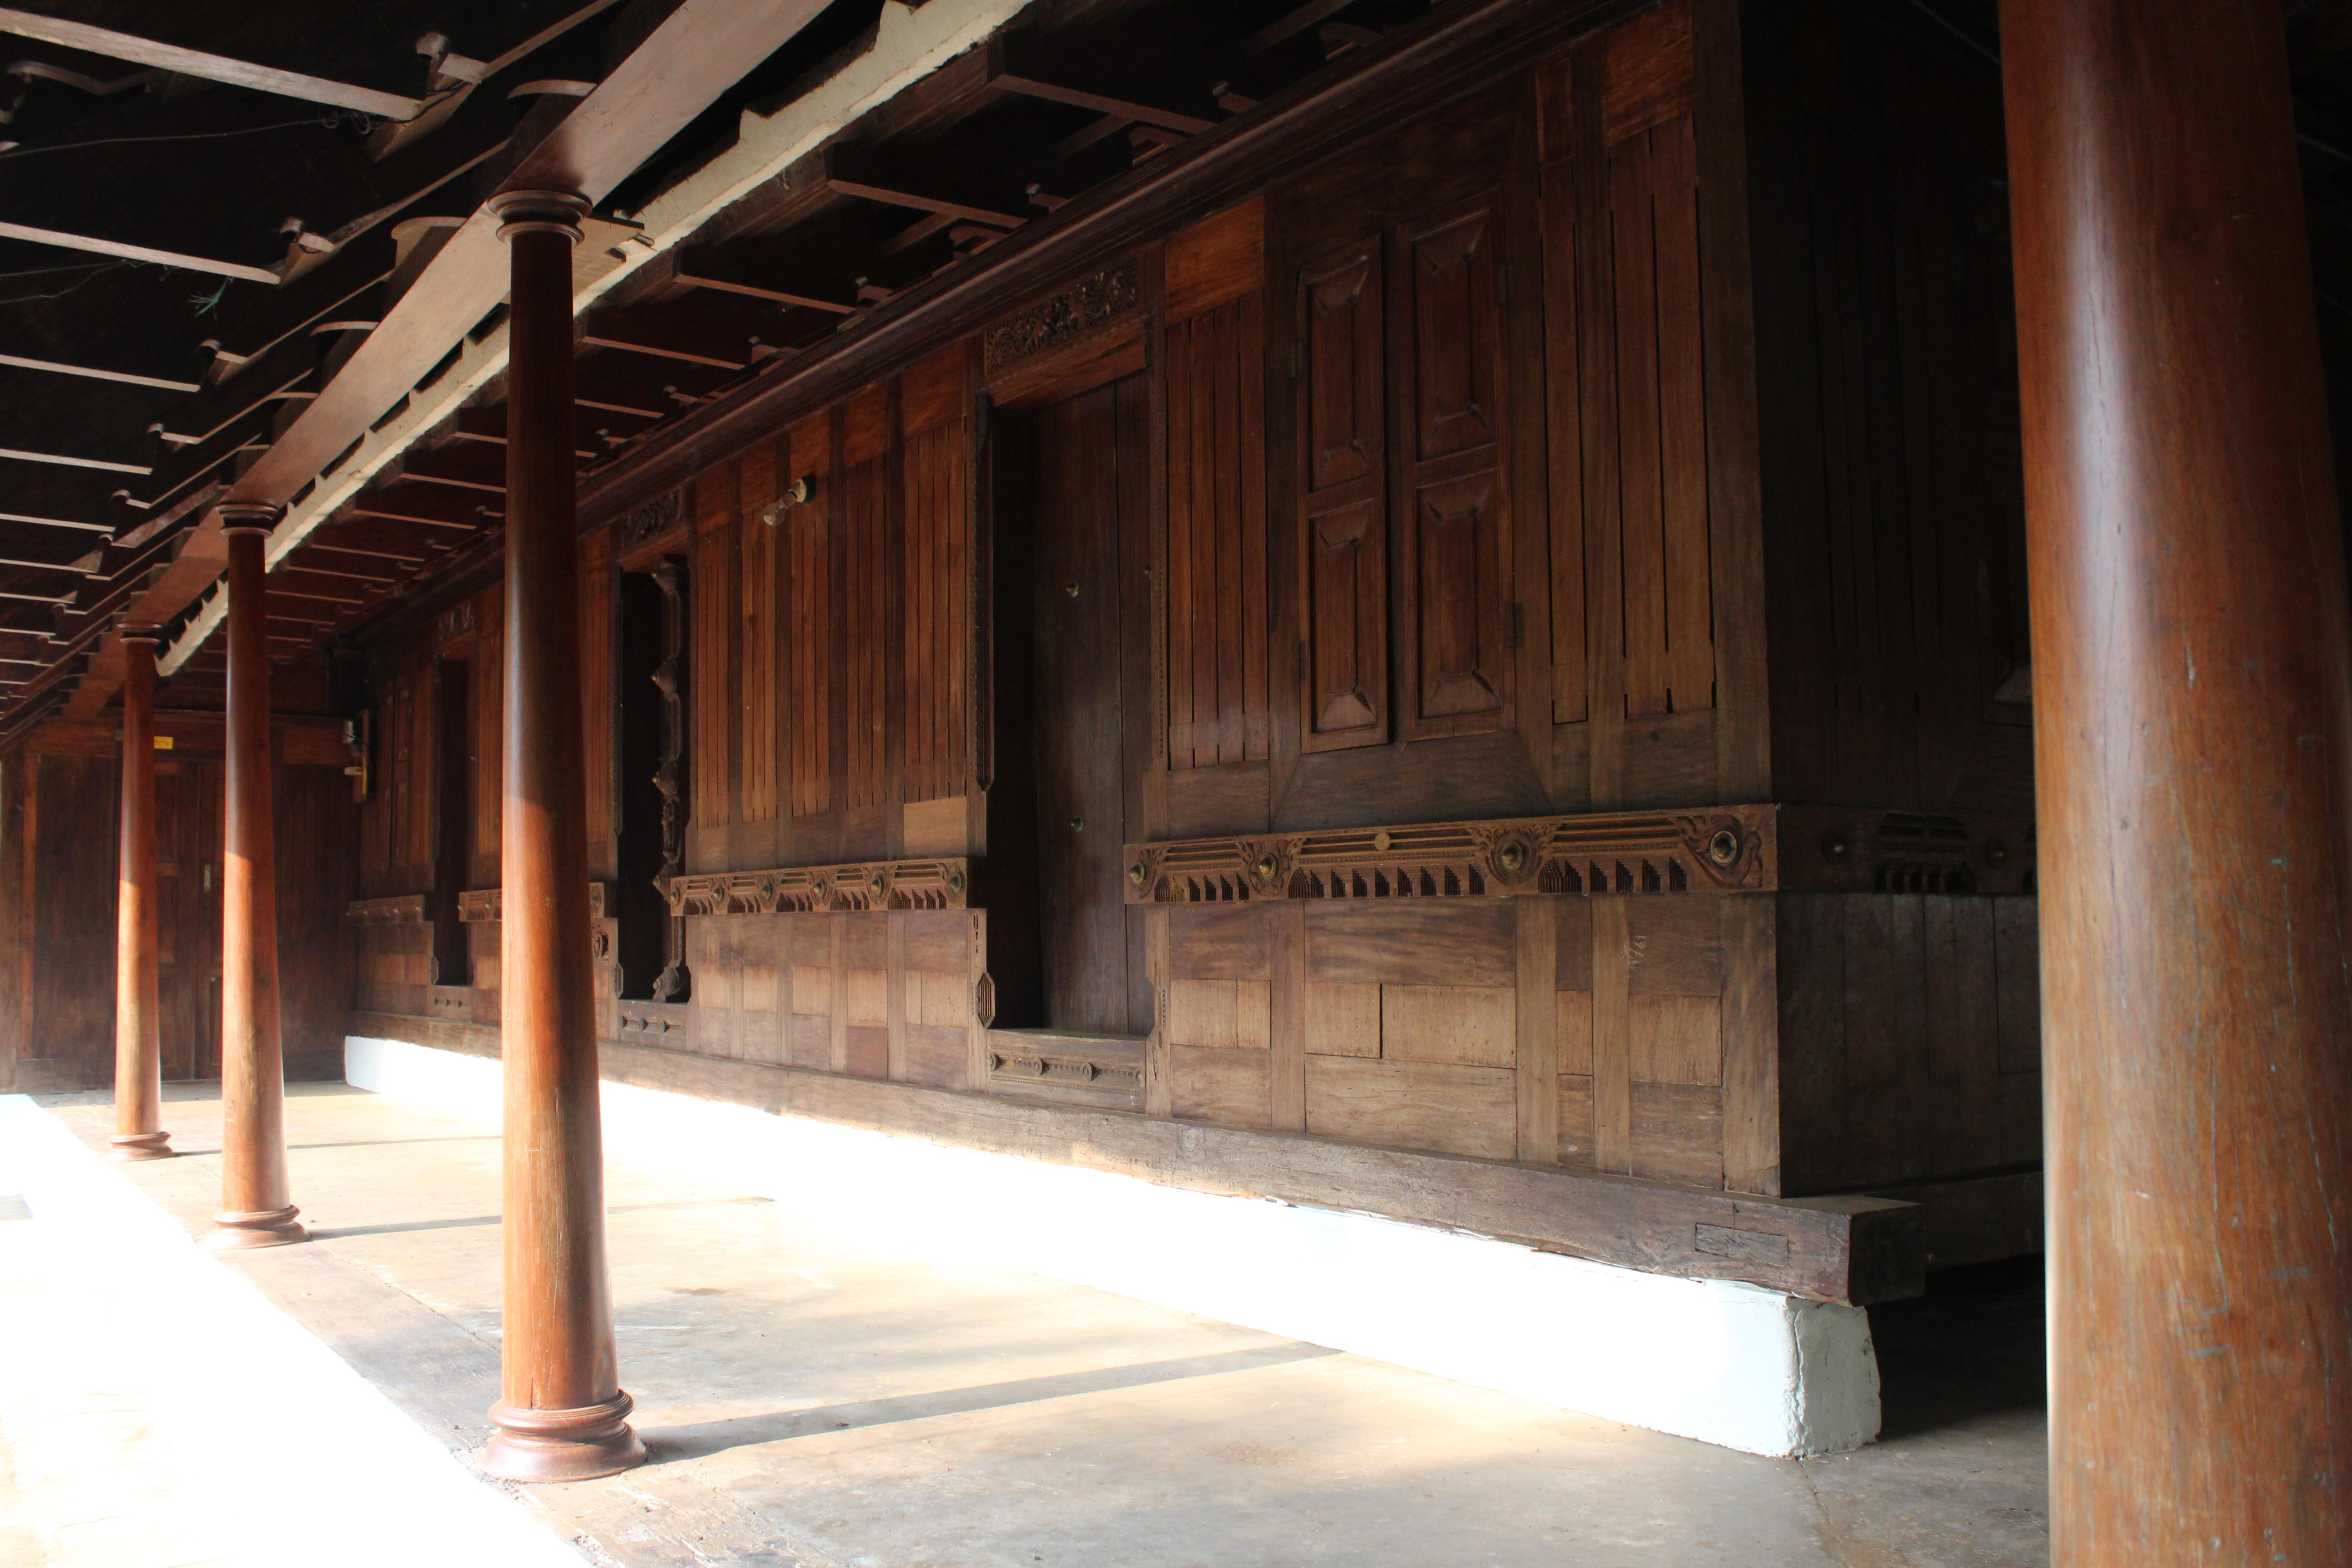 File:Chappamattam Tharavadu.jpg - Wikimedia Commons